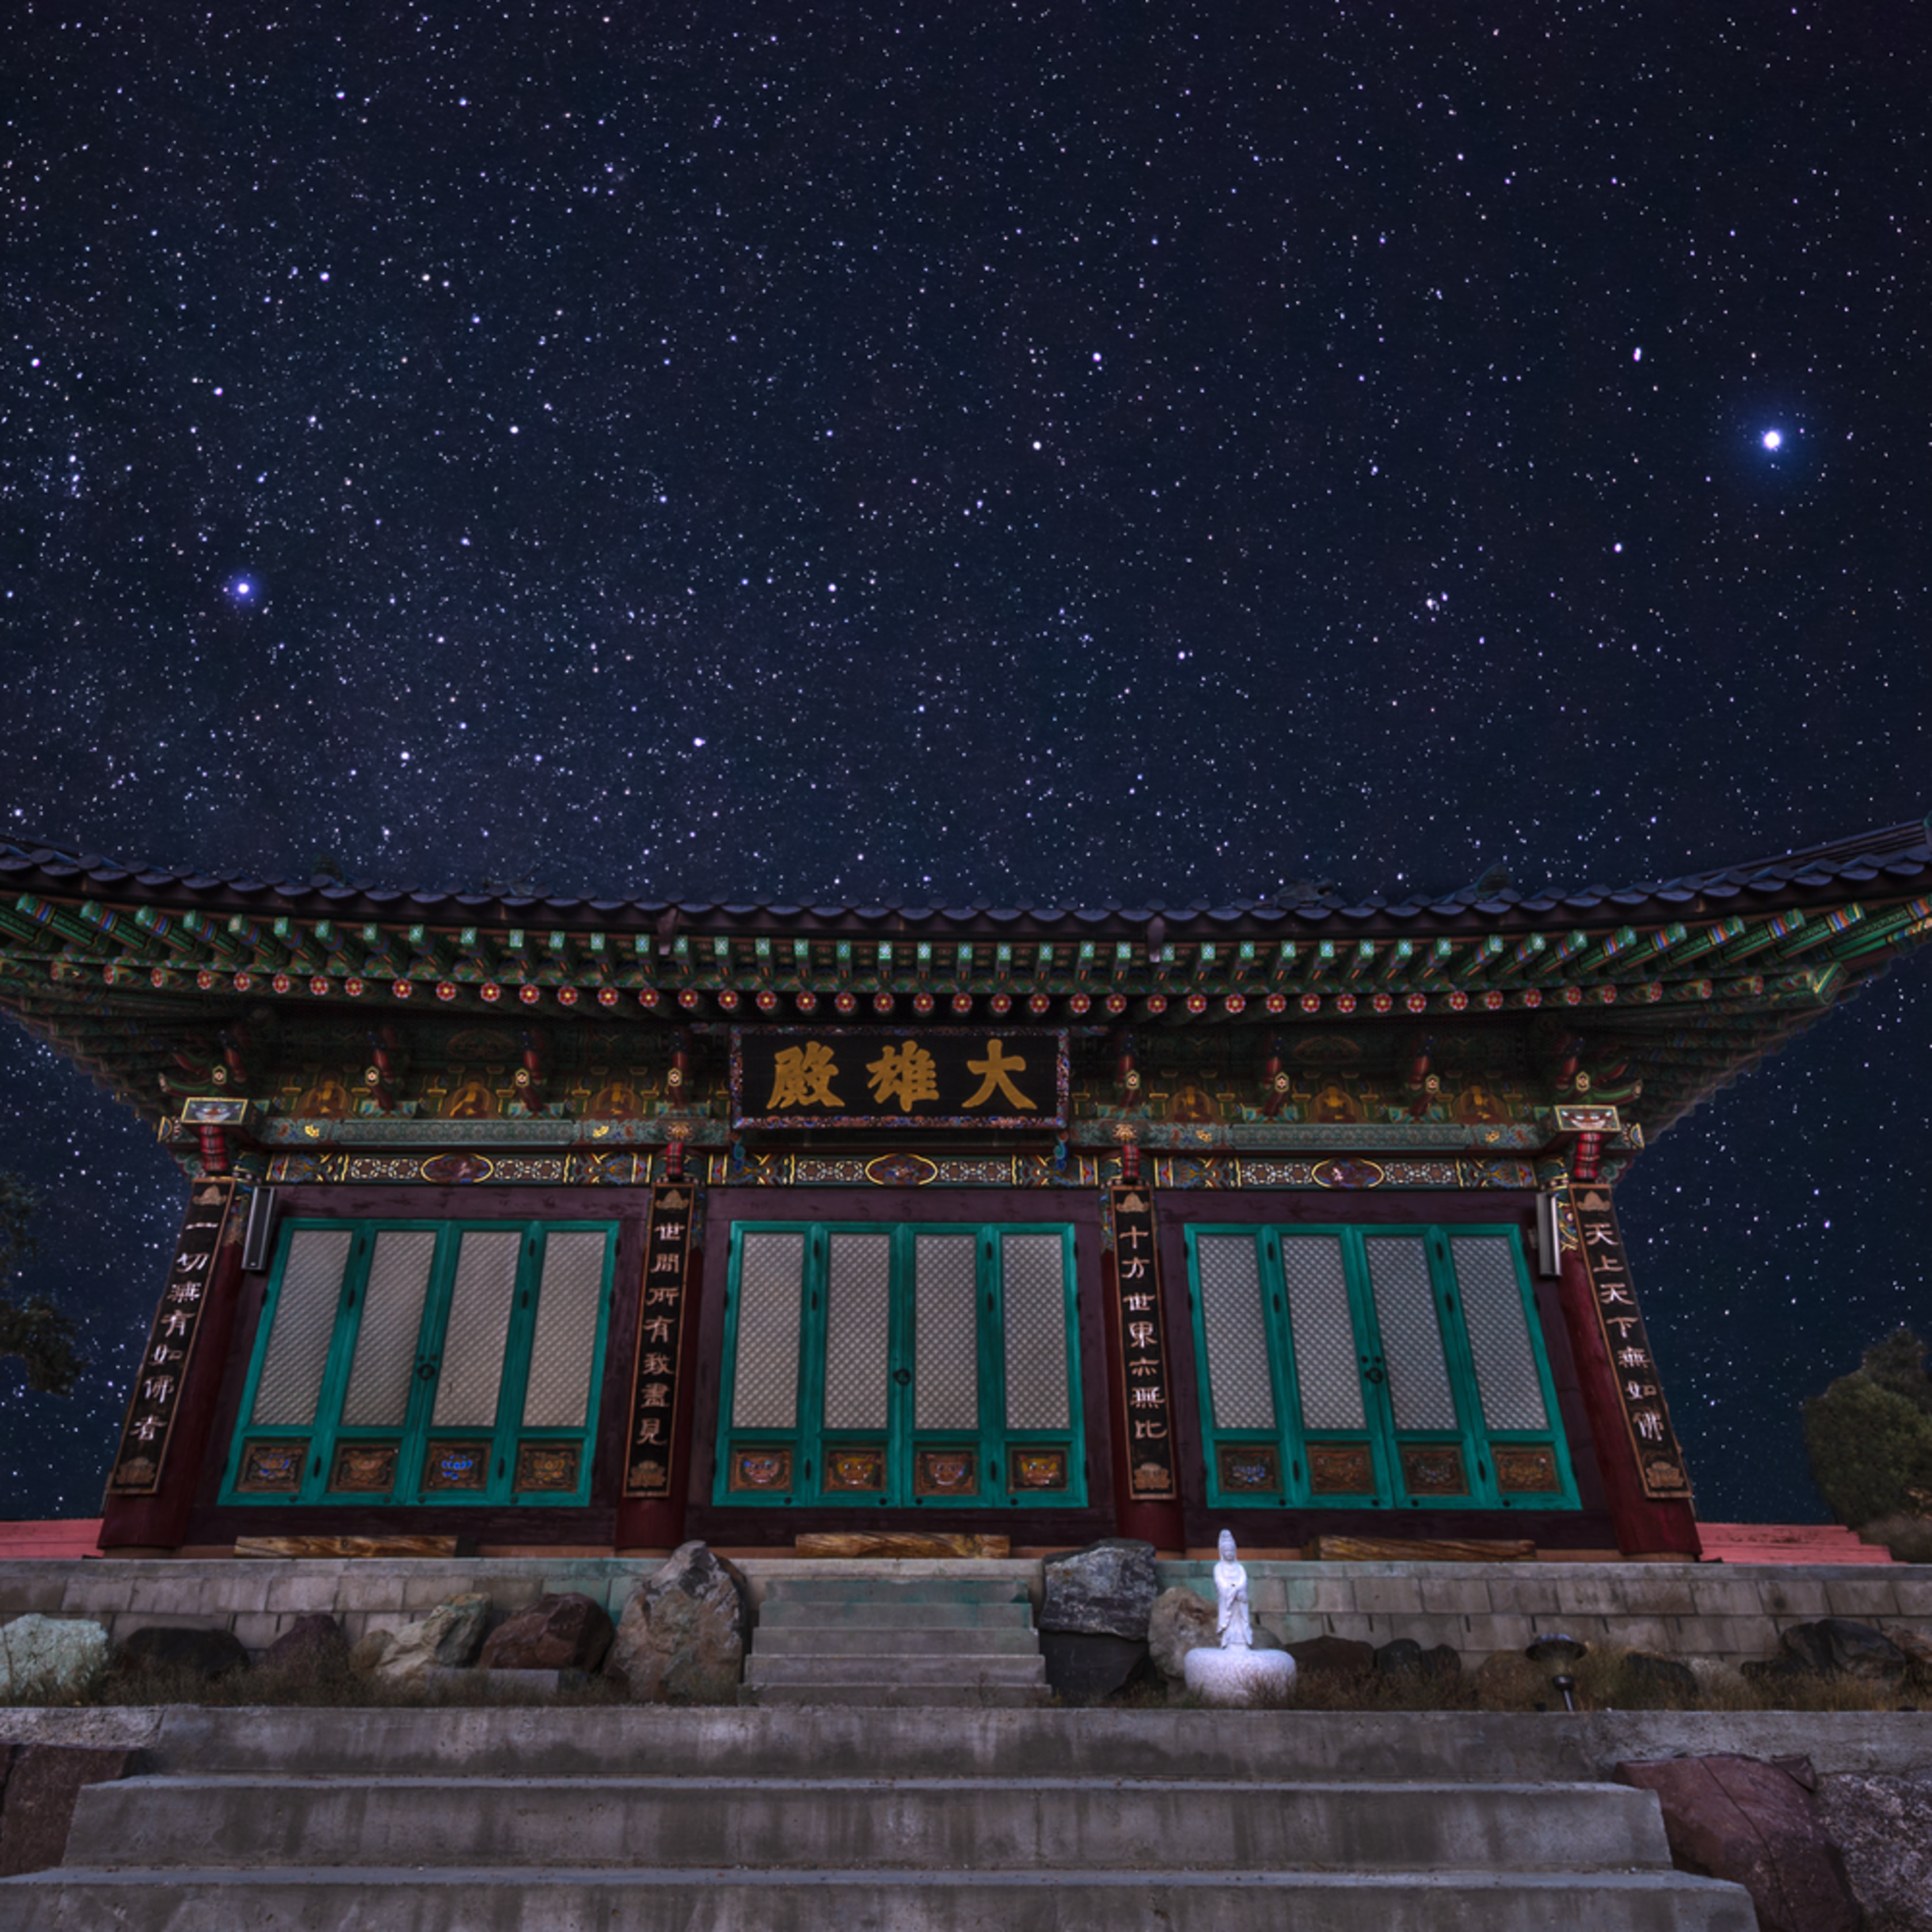 Temple heavens bkfesk